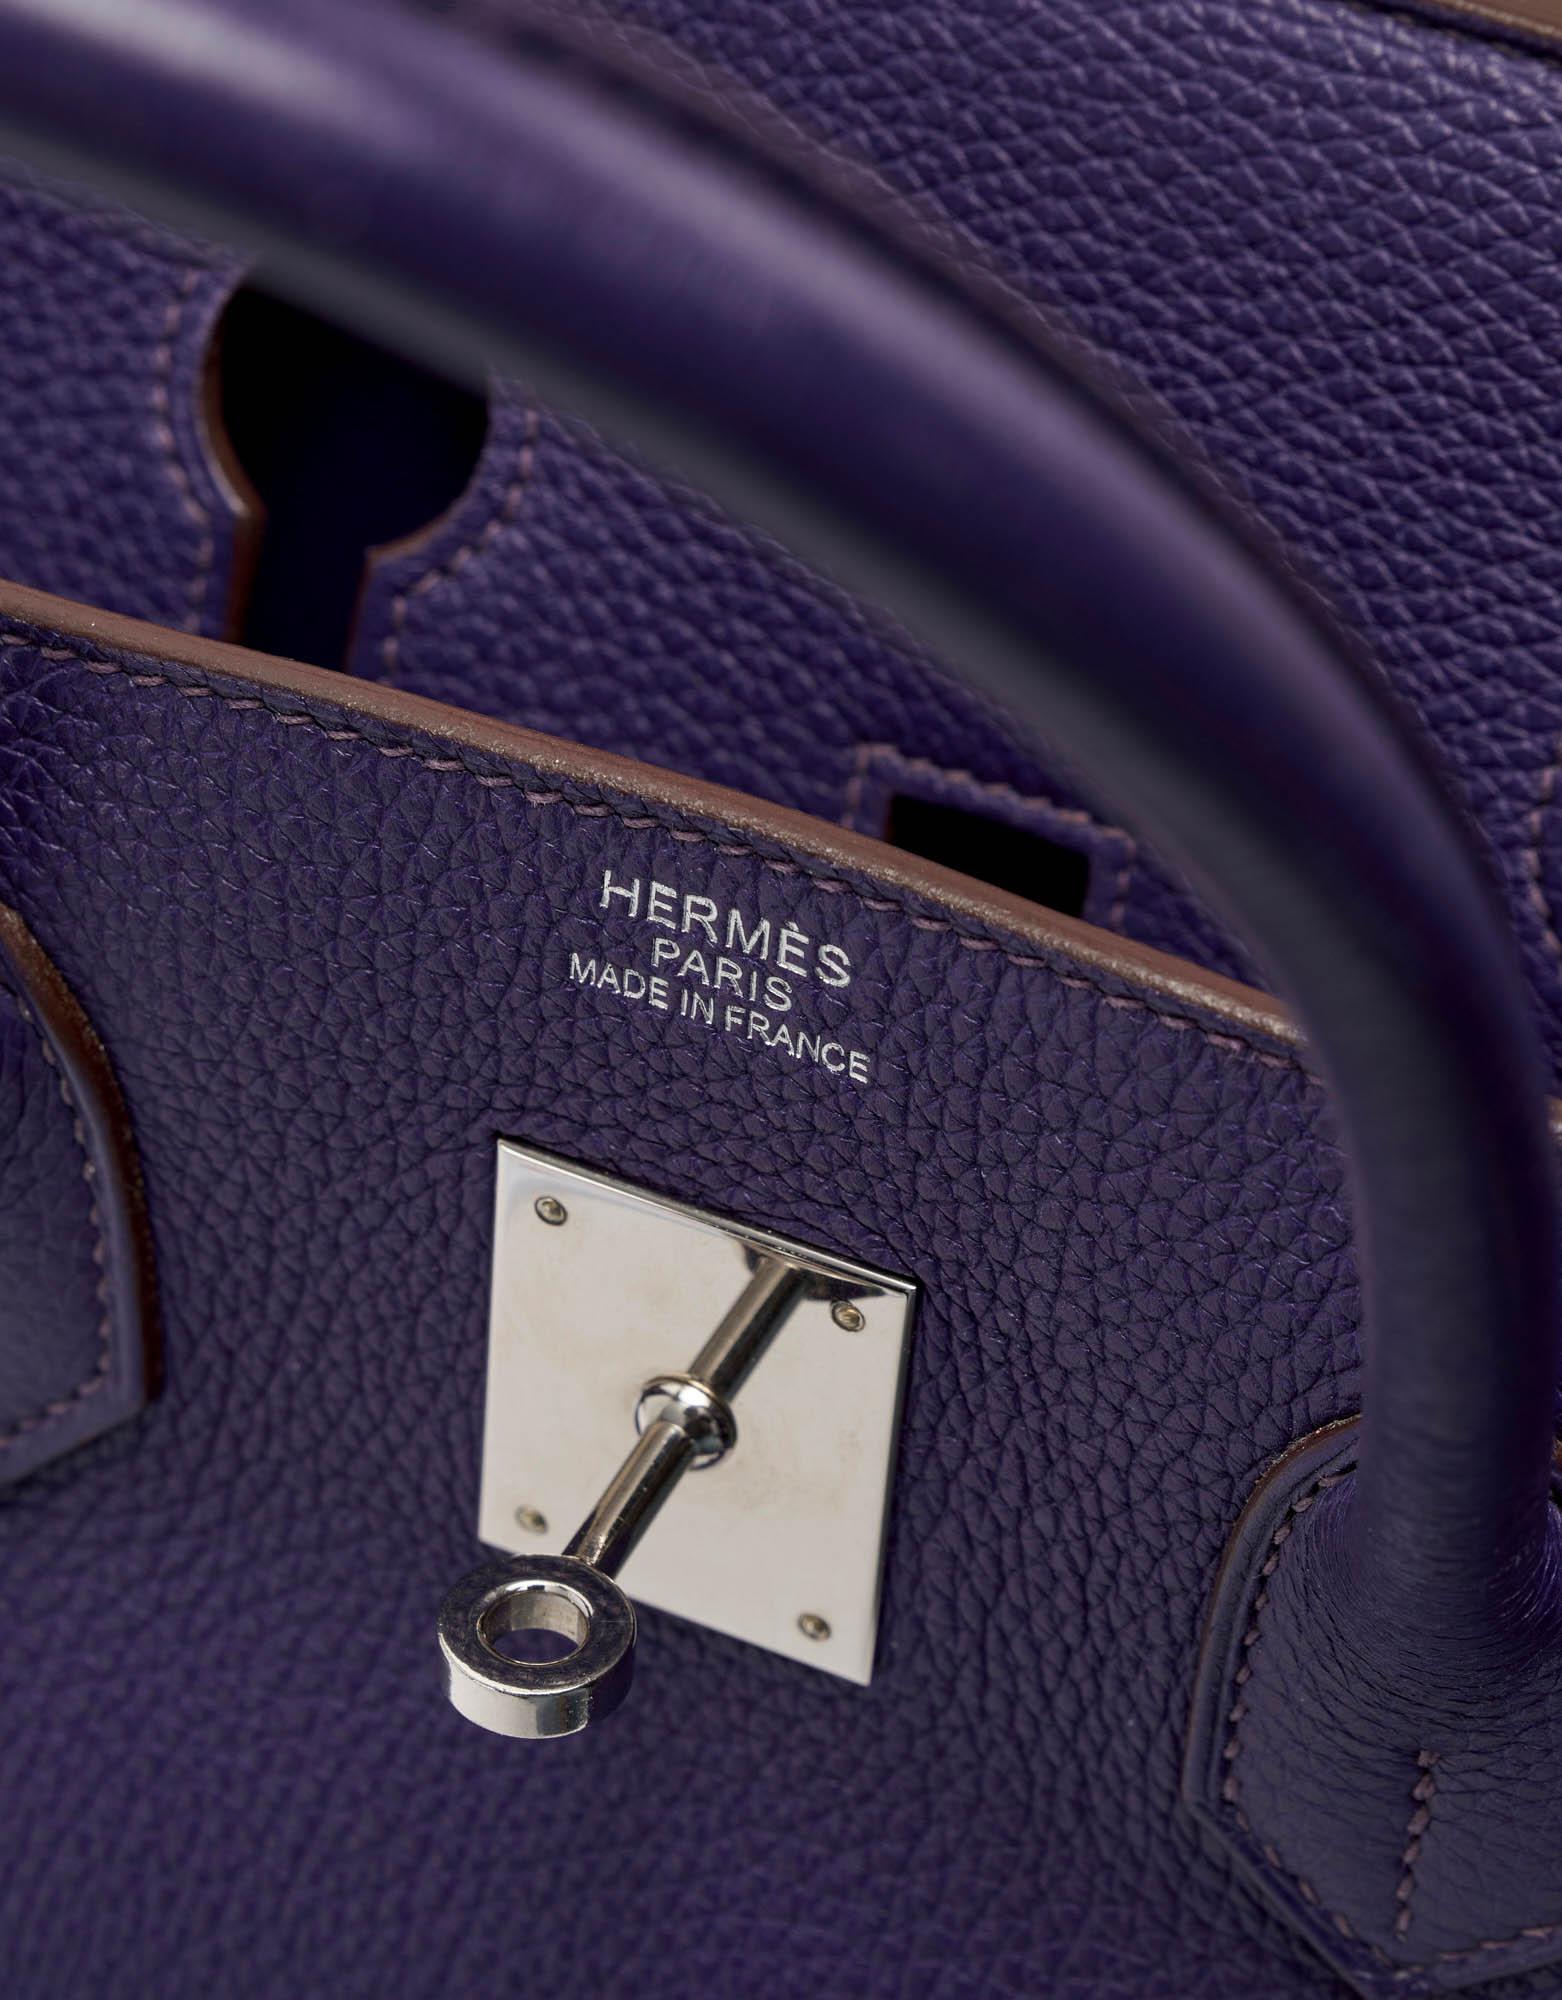 Hermès Birkin 35 Clemence Ultraviolet